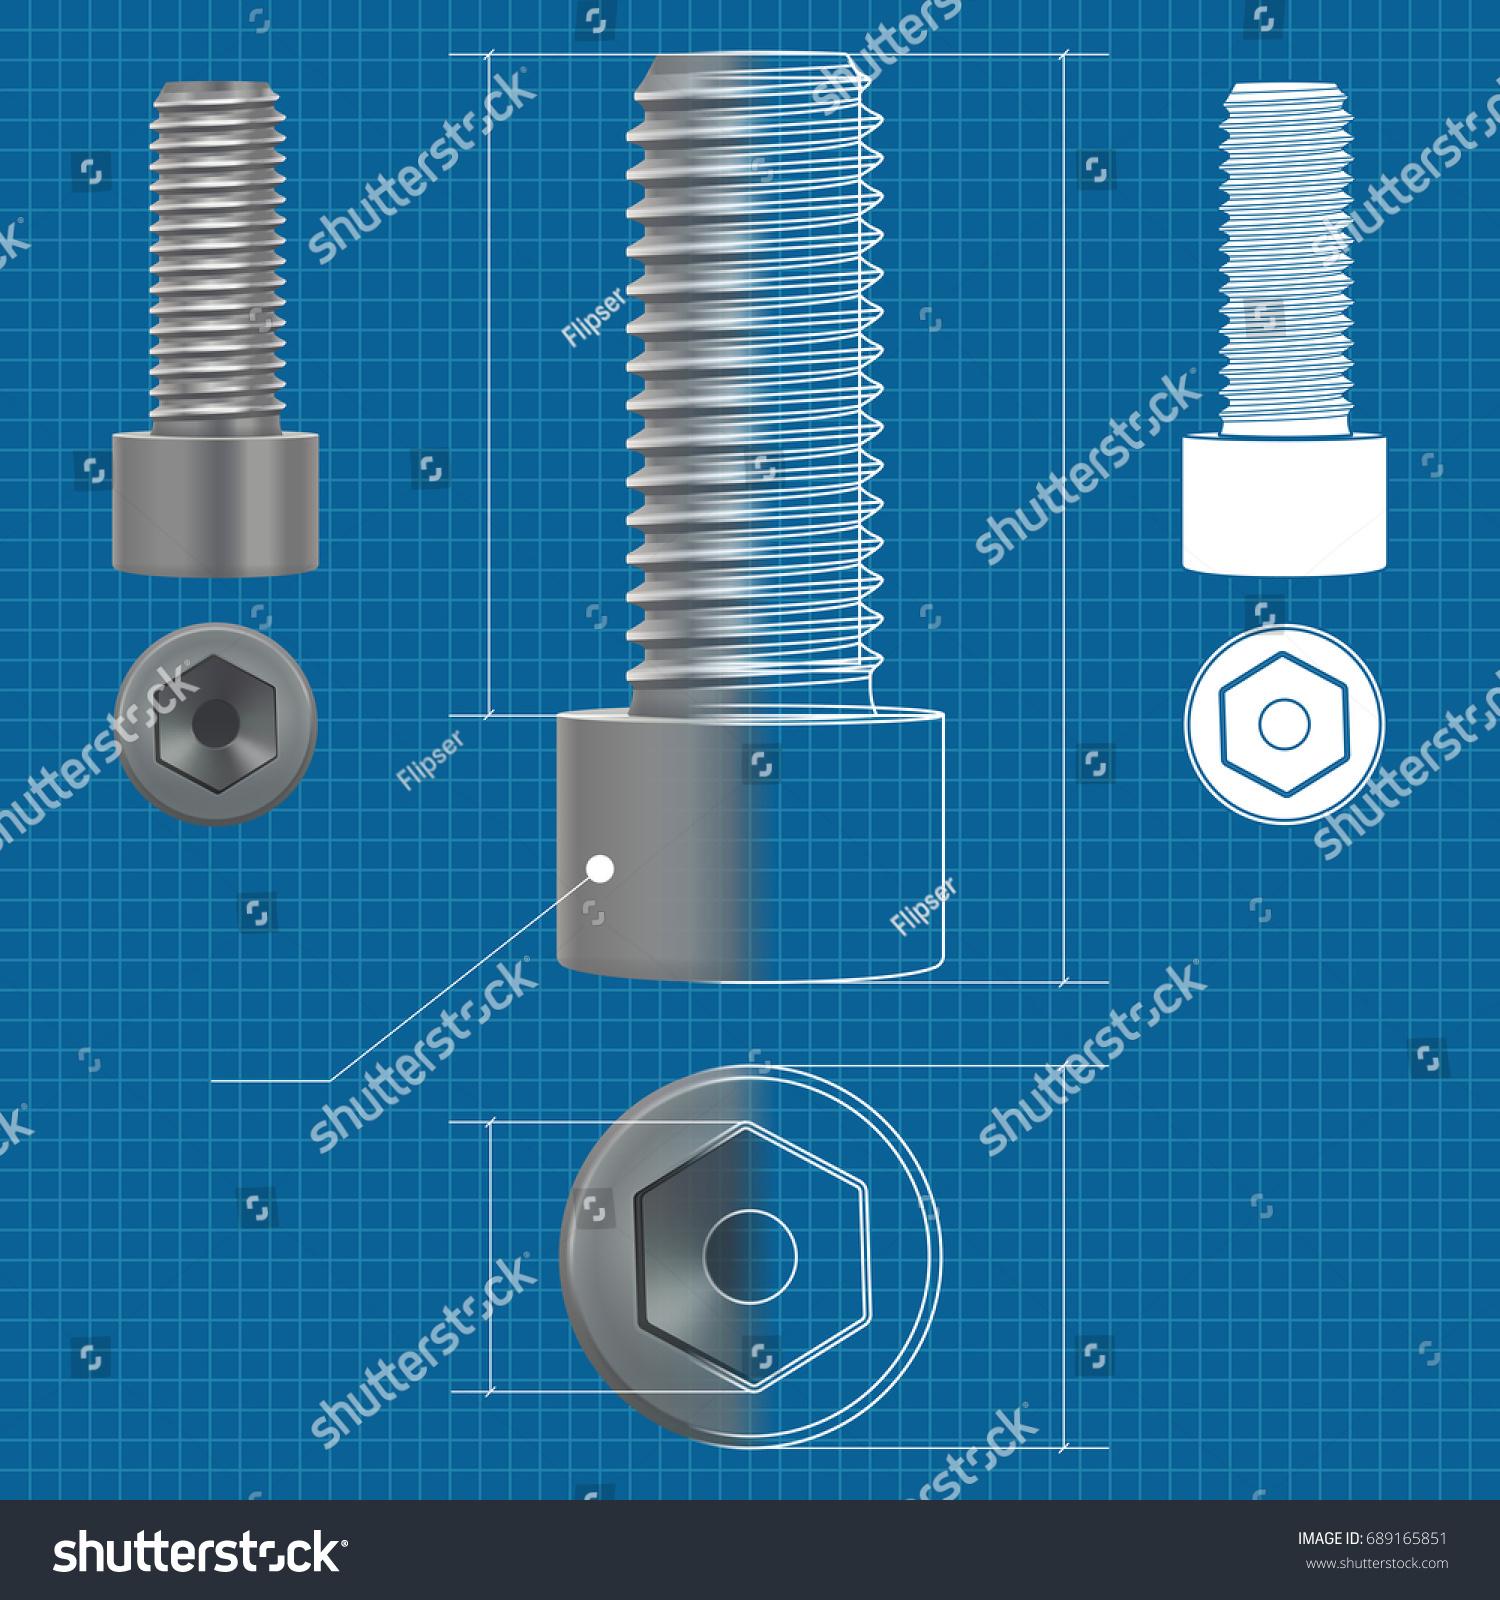 Cap hex socket bolt 3 d illustration stock illustration 689165851 cap hex socket bolt 3 d illustration stock illustration 689165851 shutterstock malvernweather Choice Image